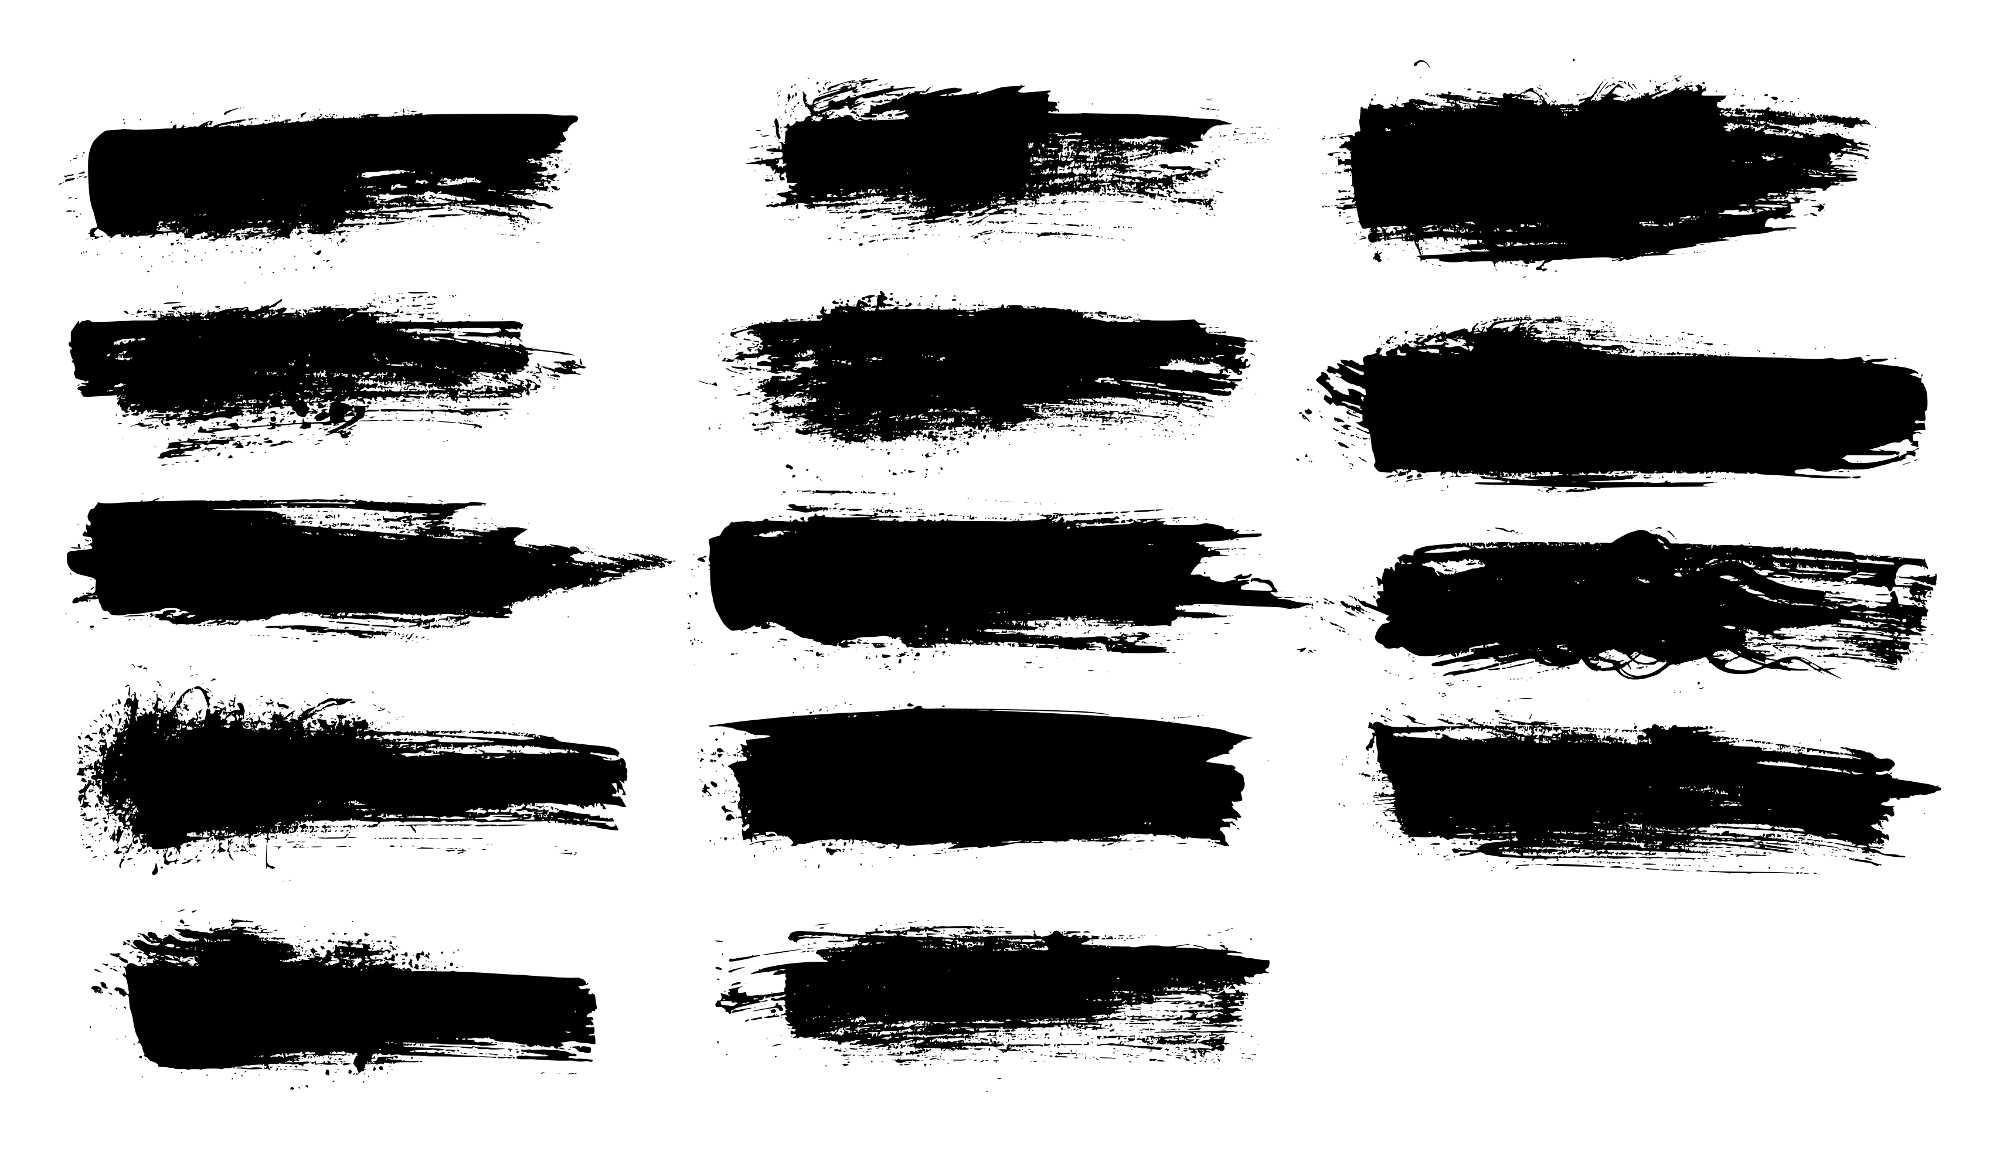 14 Grunge Brush Stroke Banner Png Transparent Vol 4 Onlygfx Com Brush Strokes Brush Png